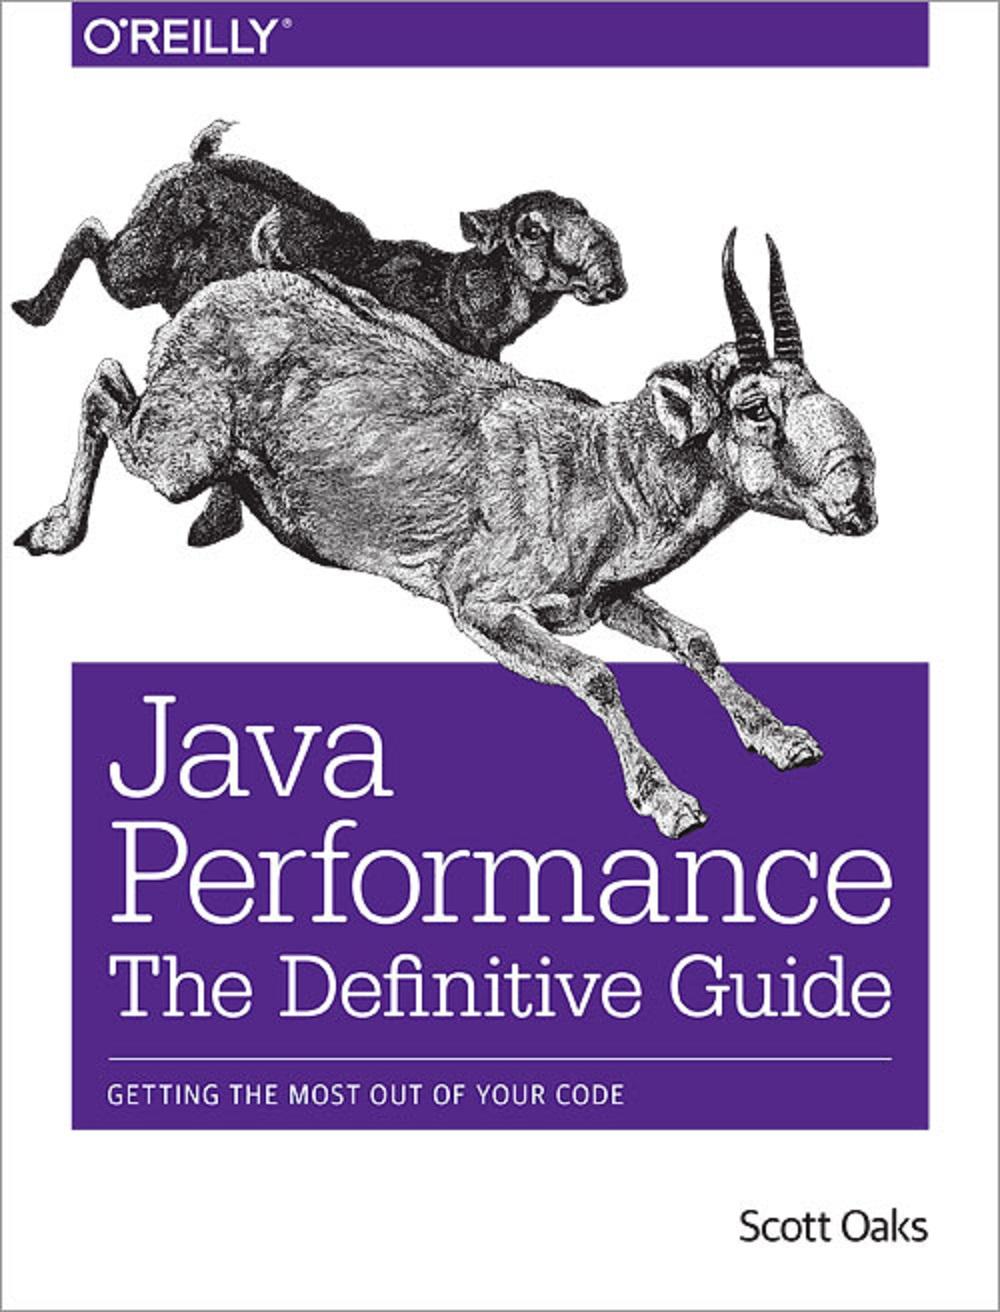 How to Generate Random Number between 1 to 10 - Java Example | Java67